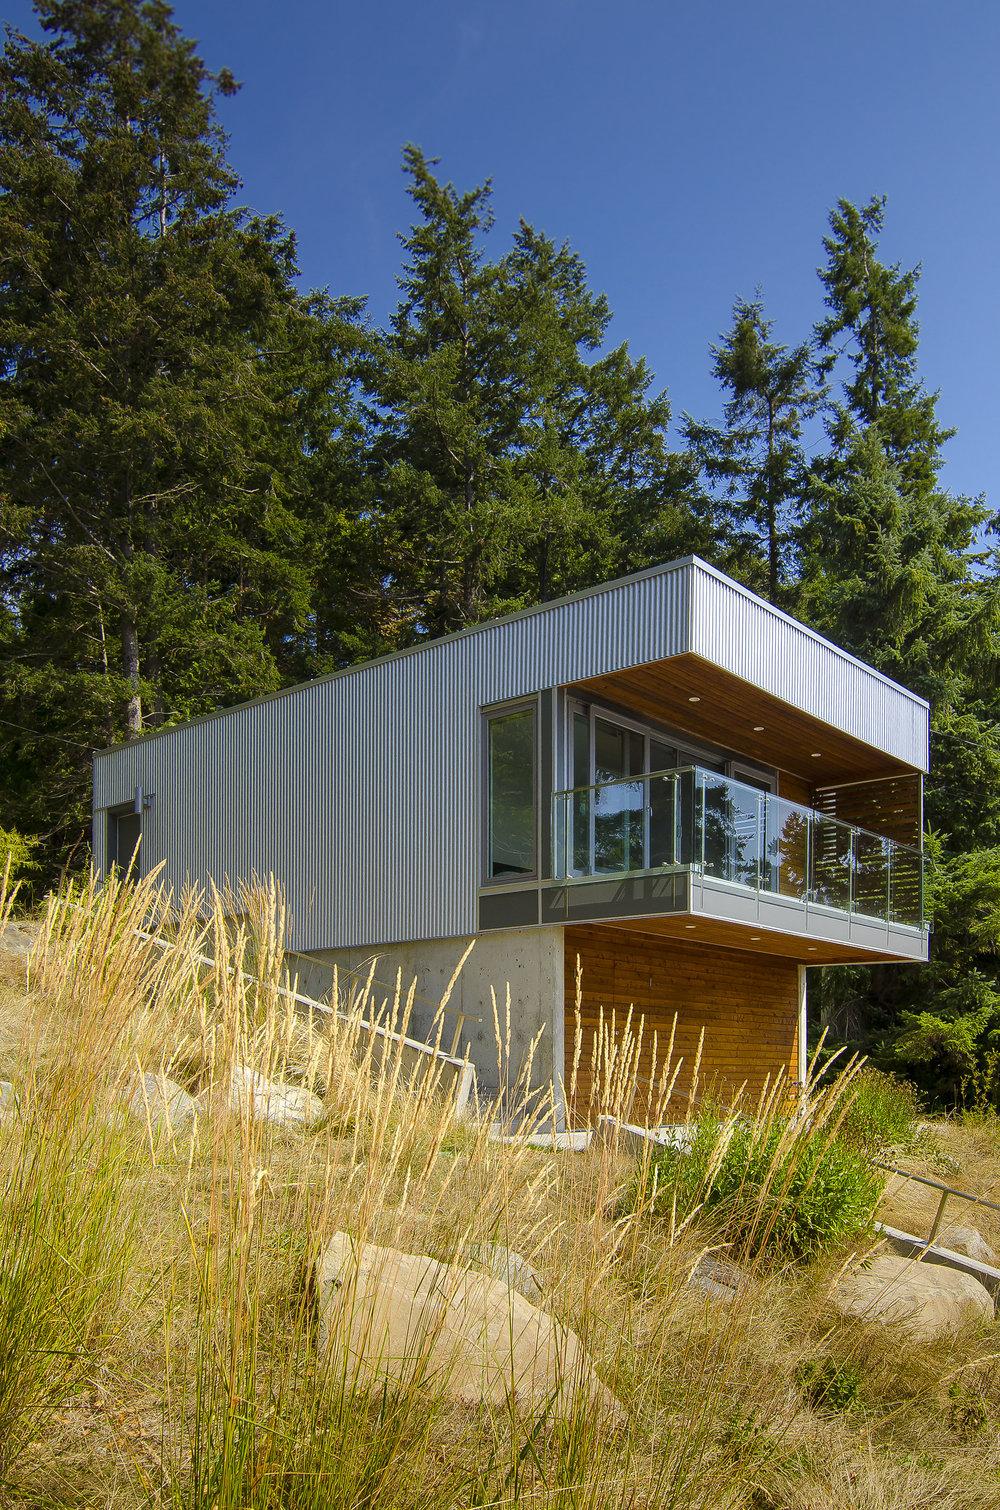 Brett-Ryan-Studios-Vancouver-Architectural-Photography-Dialog-Pender-Island-1004.jpg